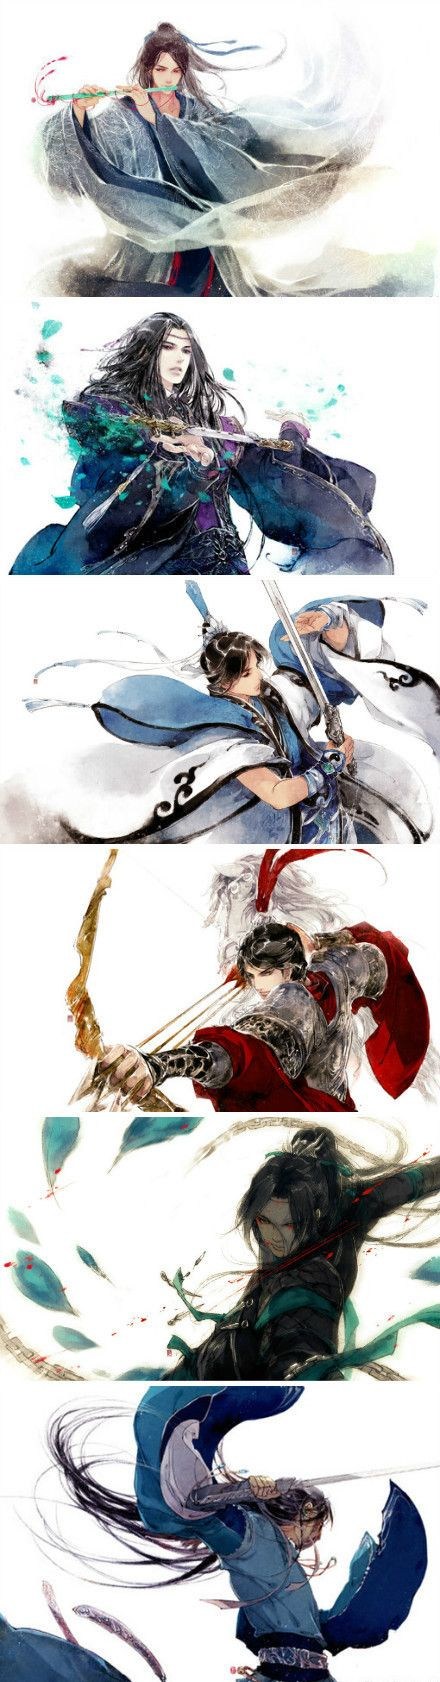 Warriors / Weapon Armor Cloak Dress Hair Character Gloves